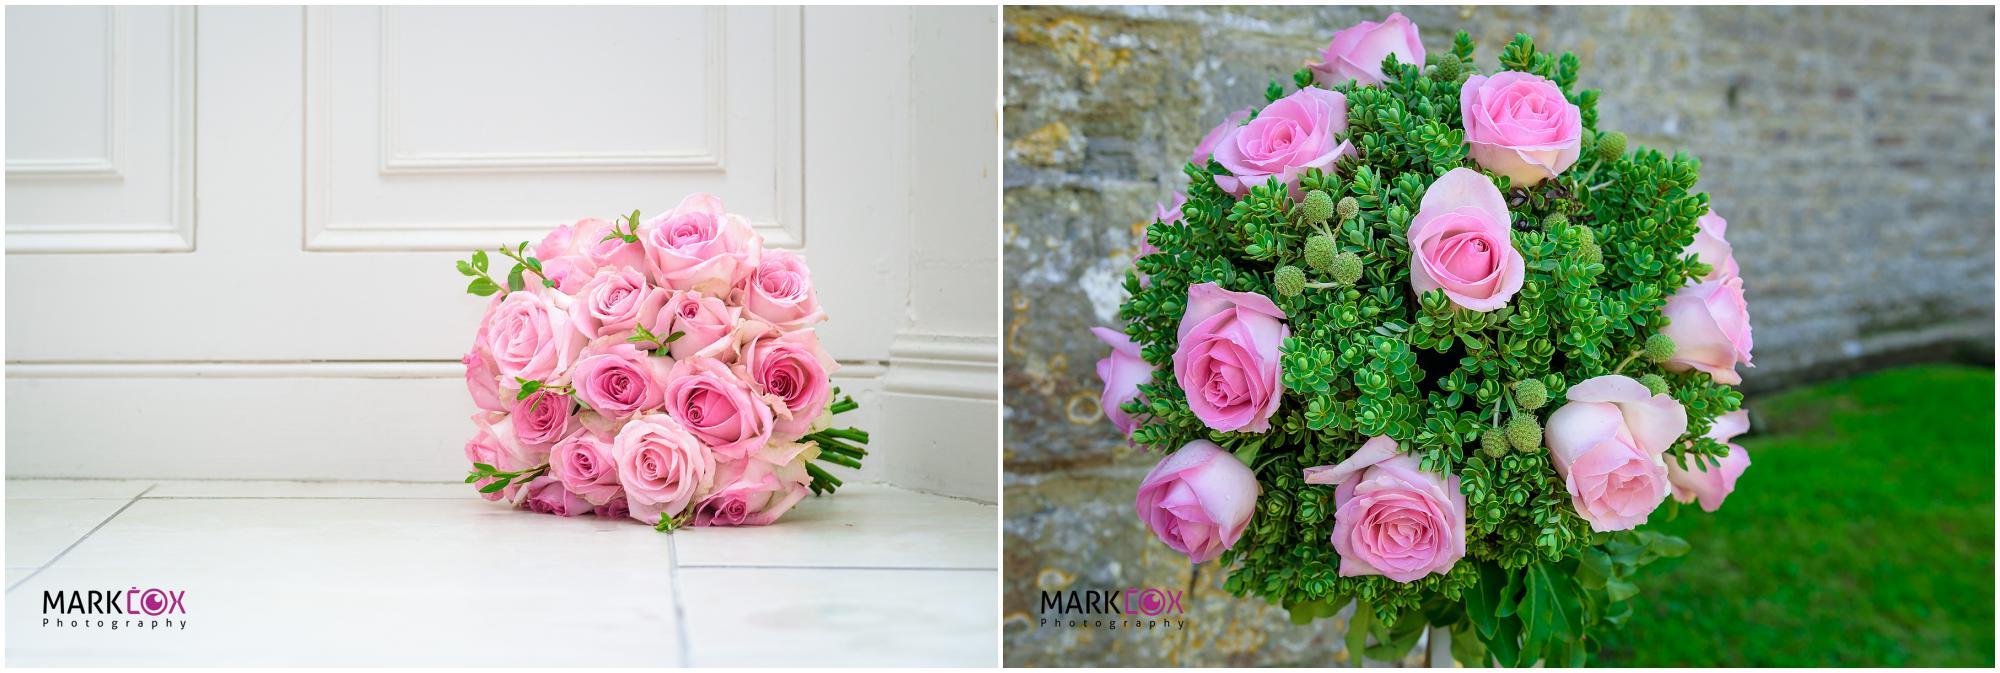 Pink Roses 2 - Taunton Wedding Photographer -001